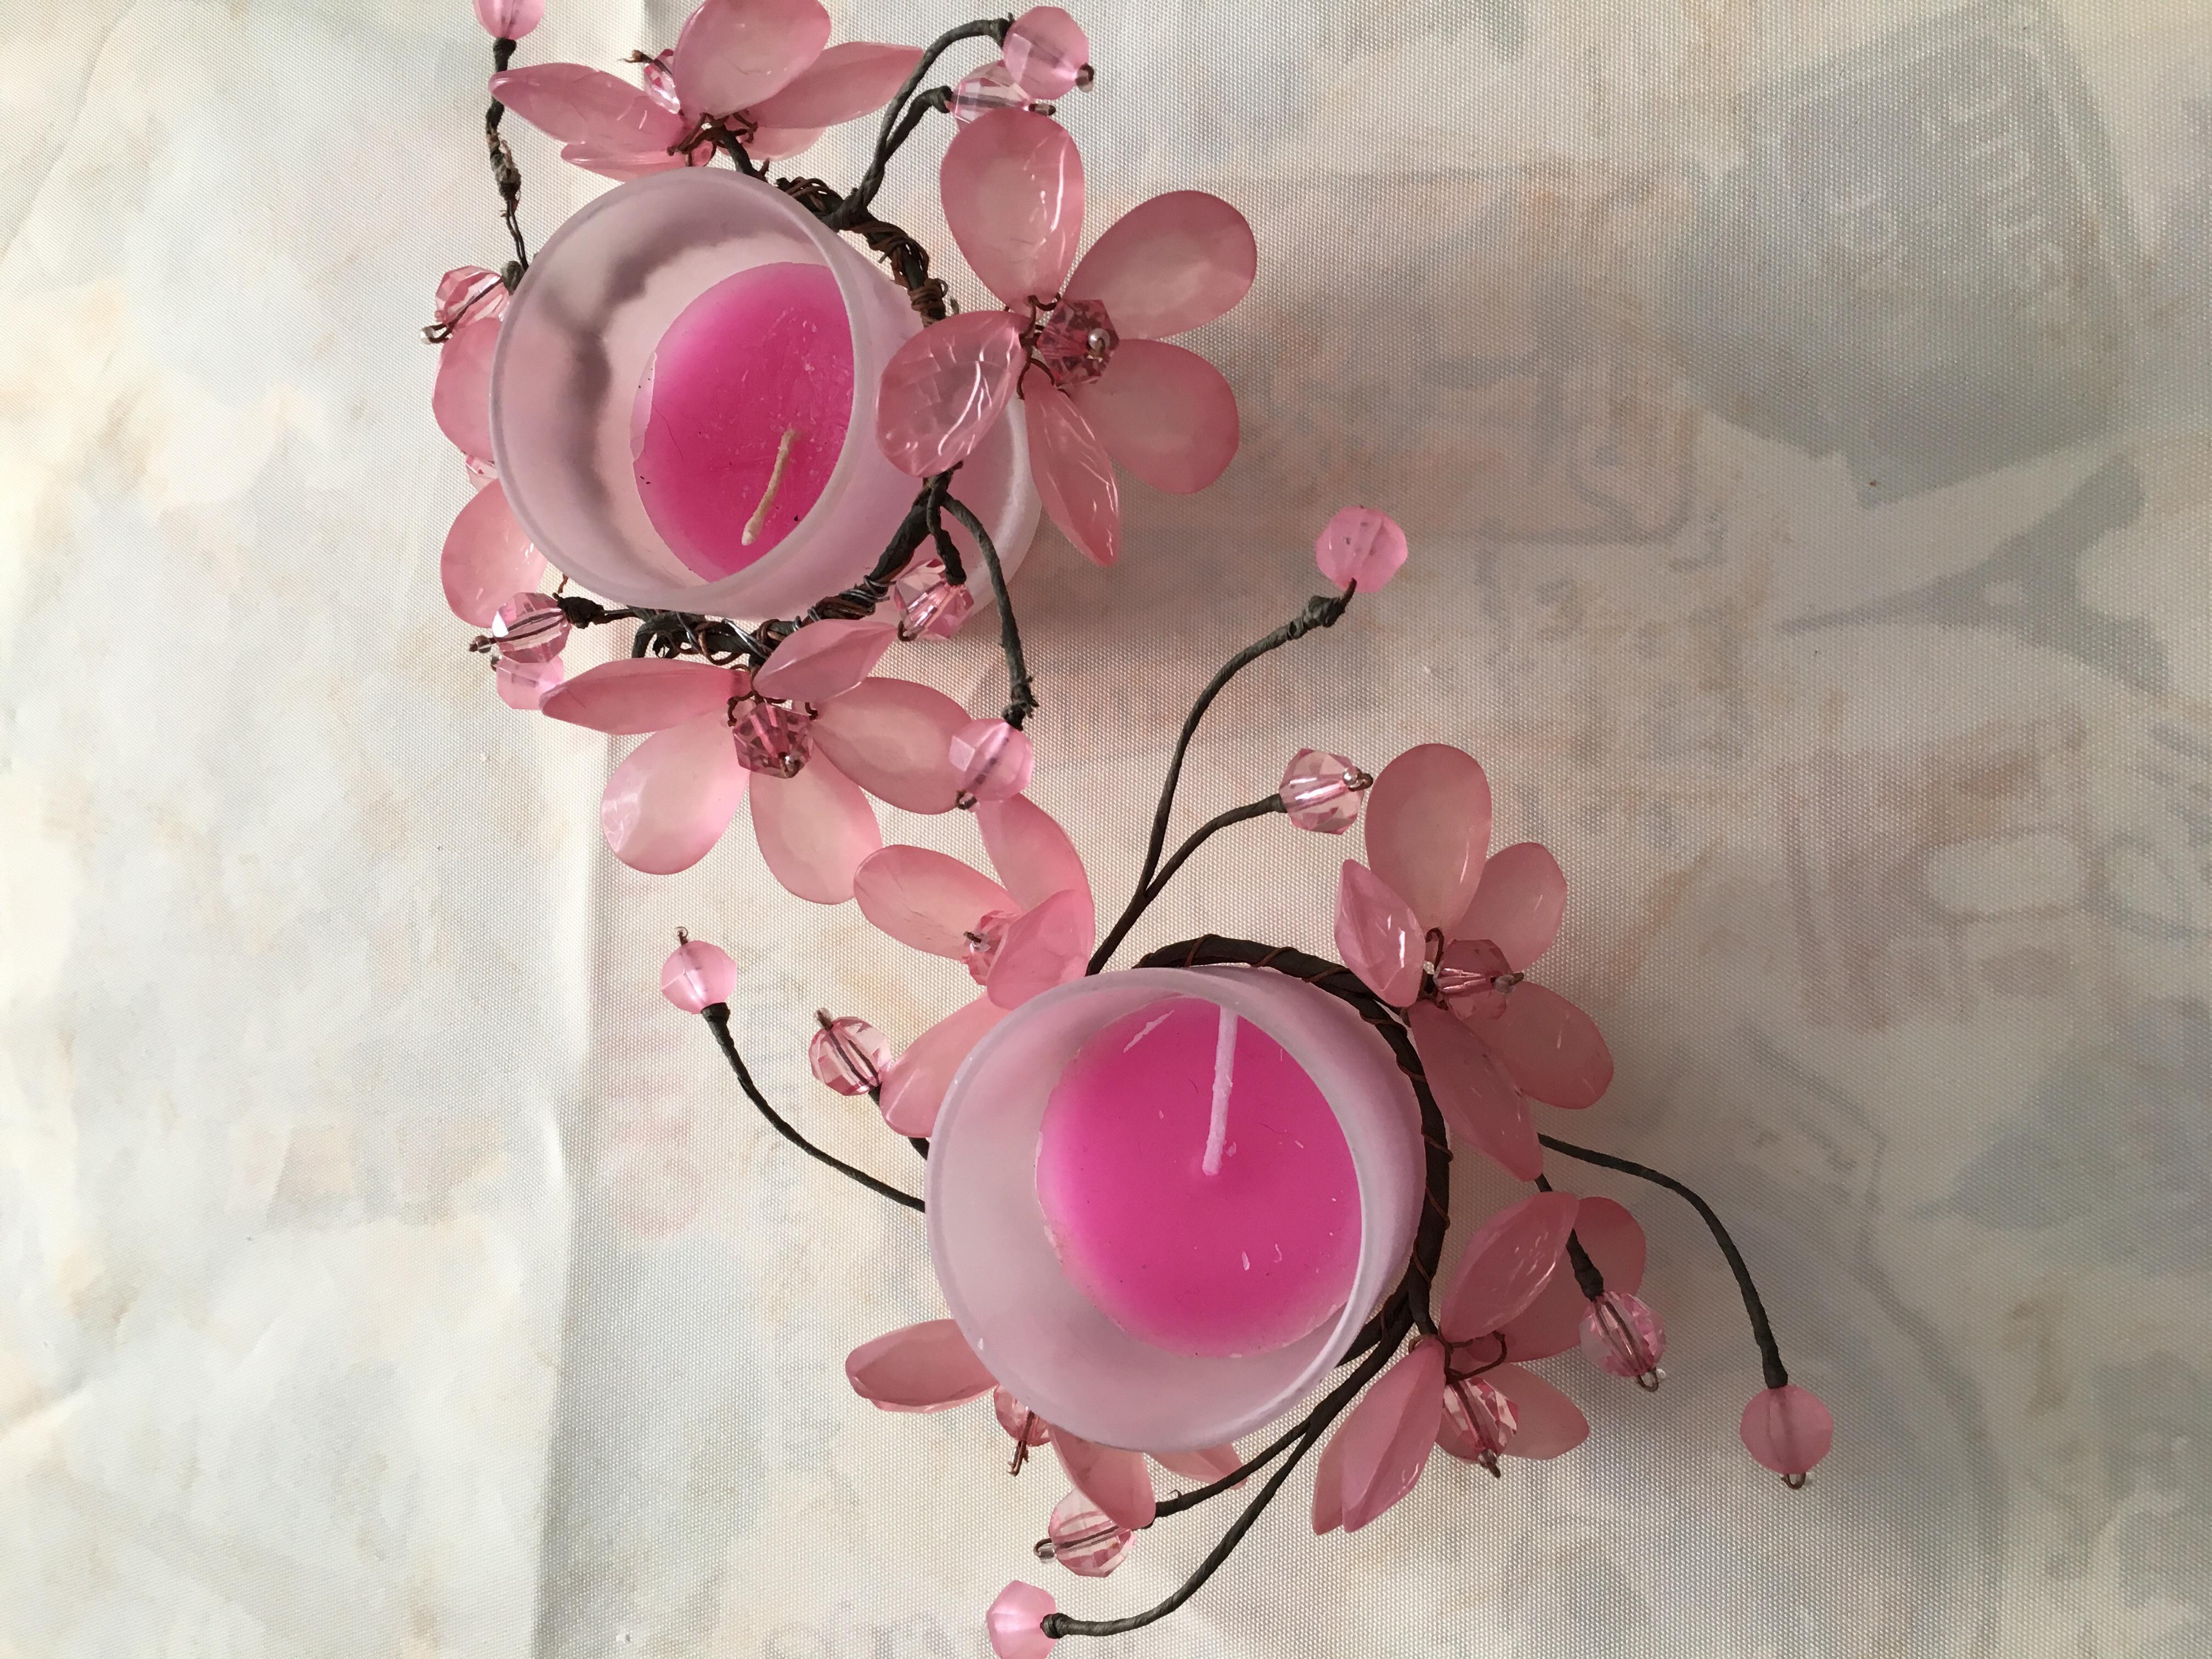 lot de bougeoires roses 2 Nancy (54)